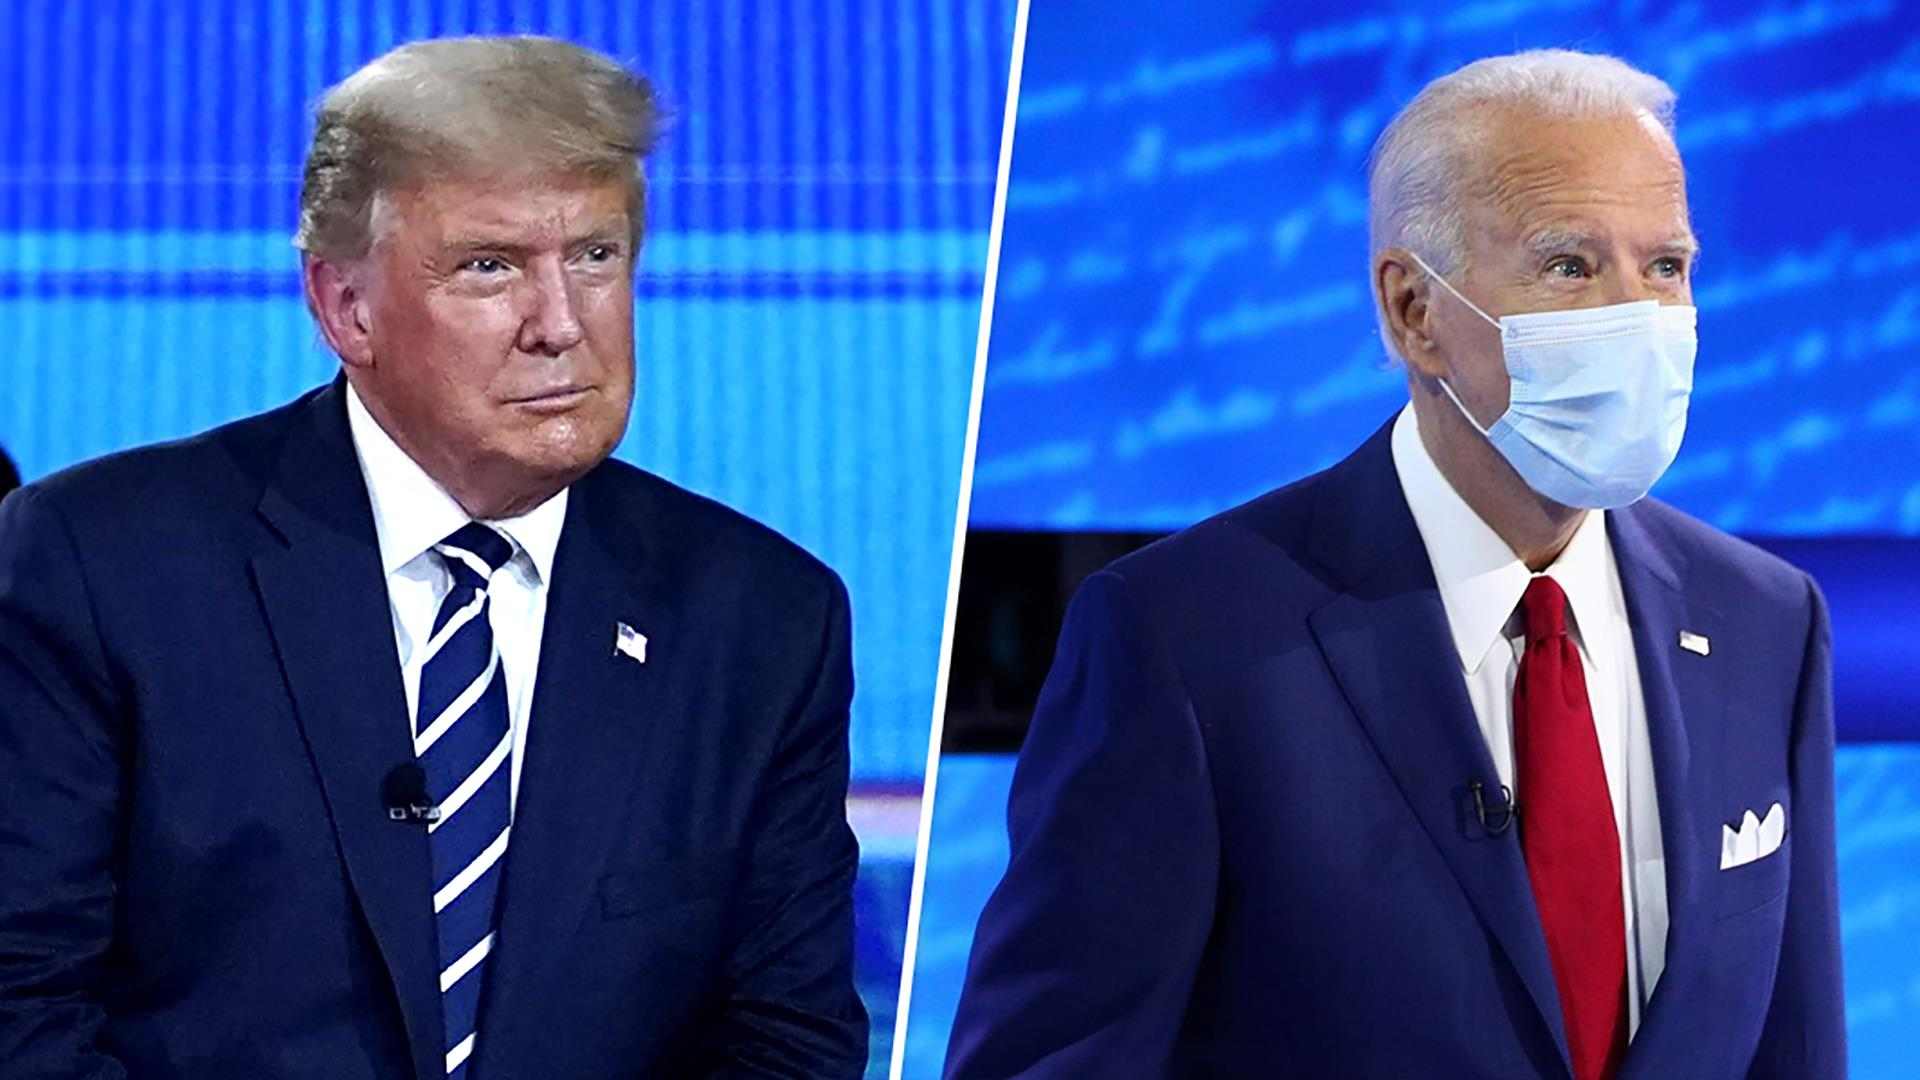 AP fact check: Rhetoric from Trump, Biden in the non-debate